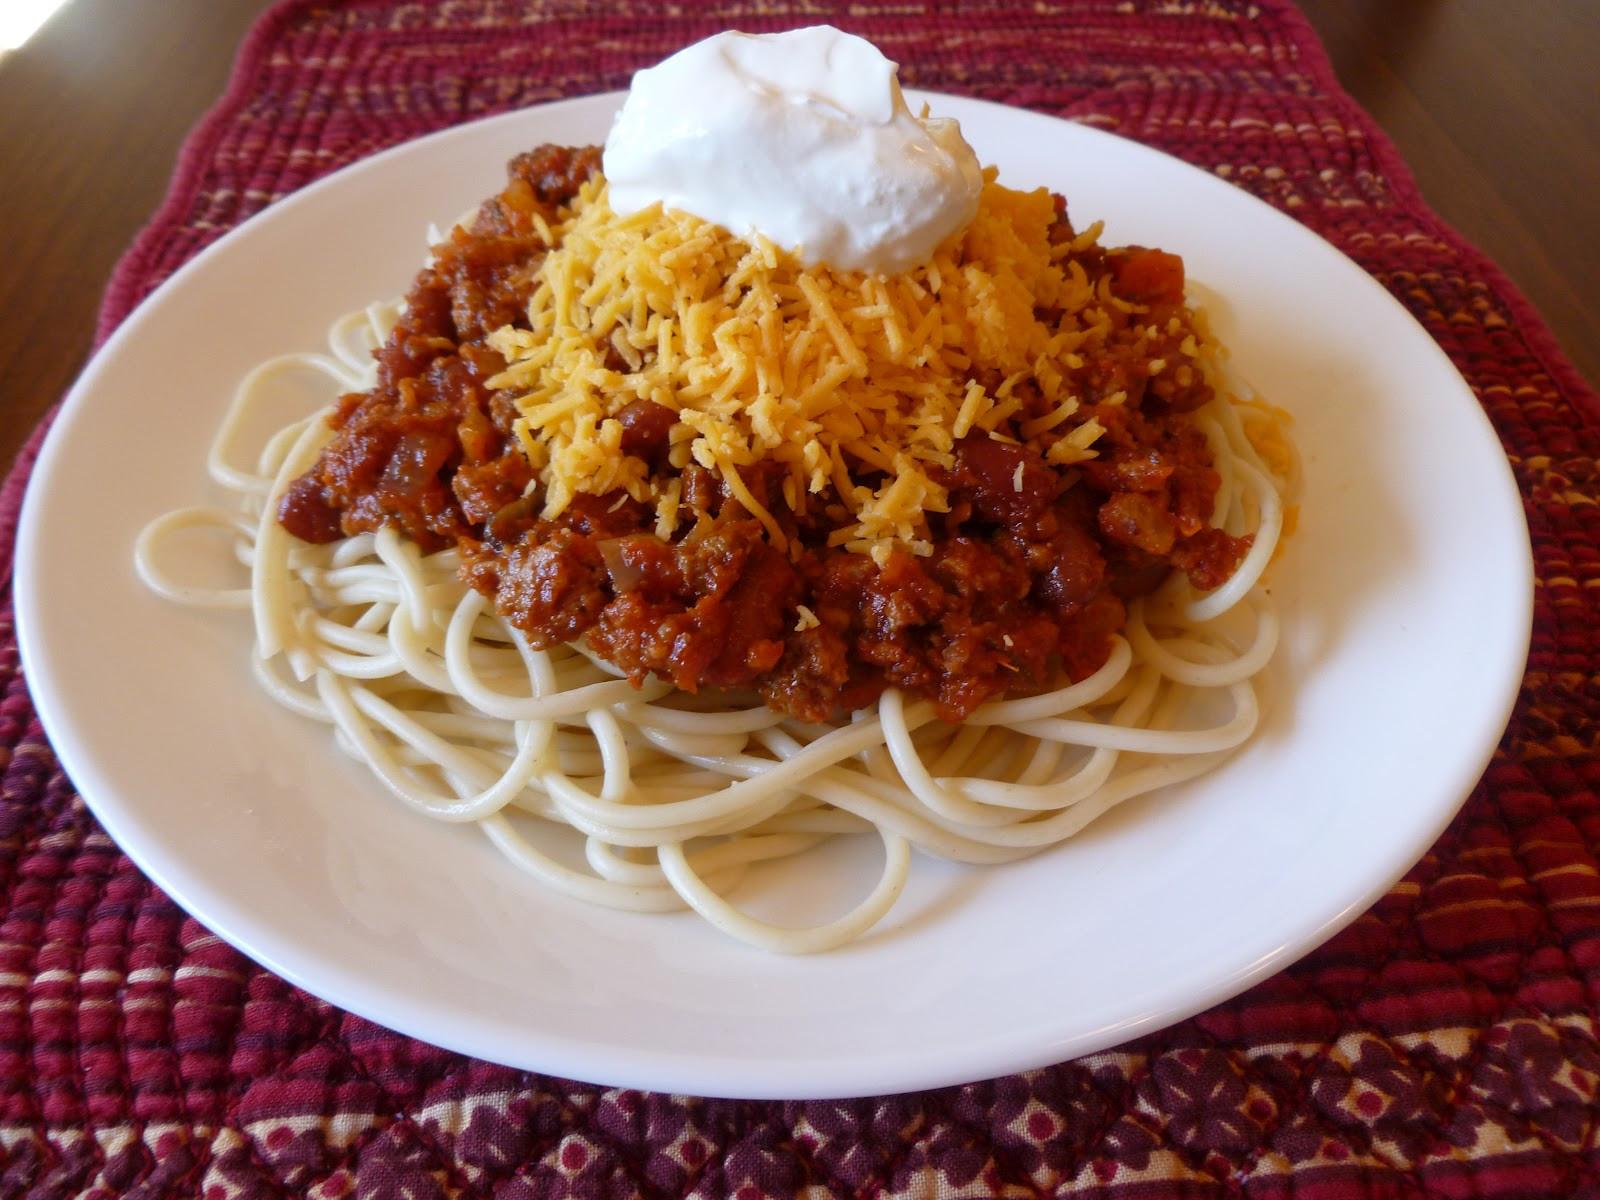 Chili On Spaghetti  Chili Spaghetti Joyful Homemaking